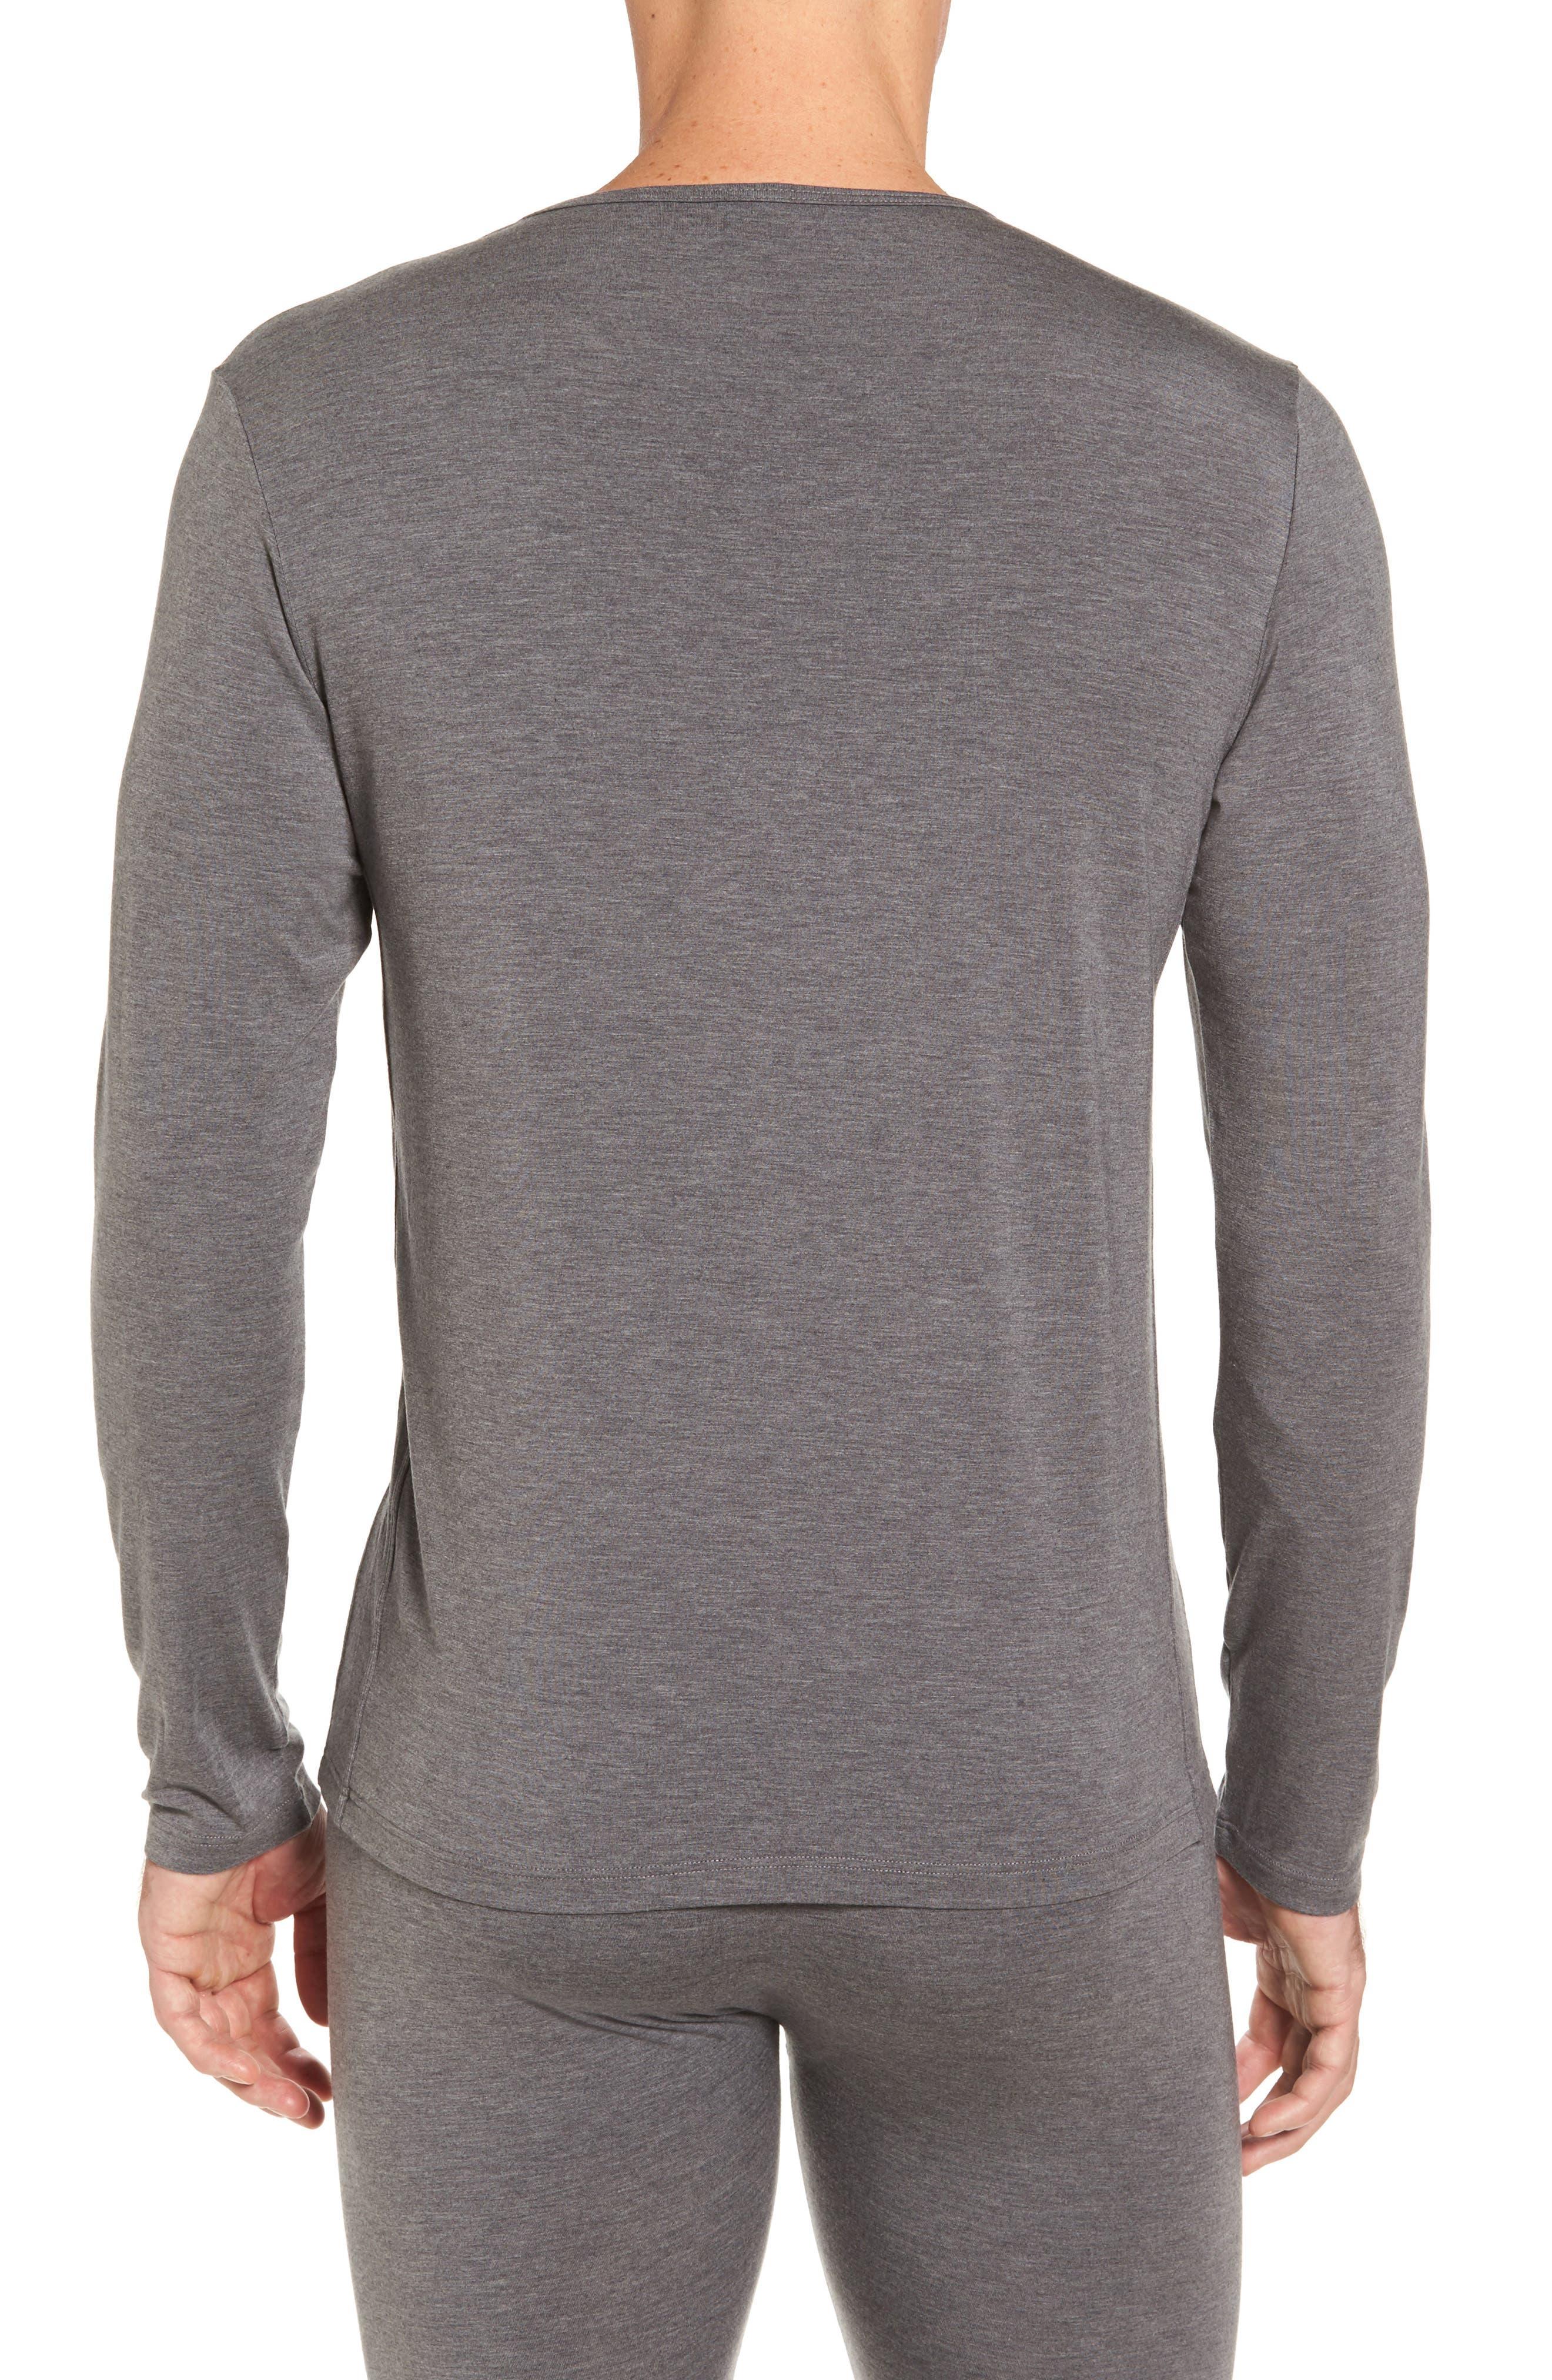 Thermal Long Sleeve T-Shirt,                             Alternate thumbnail 2, color,                             020